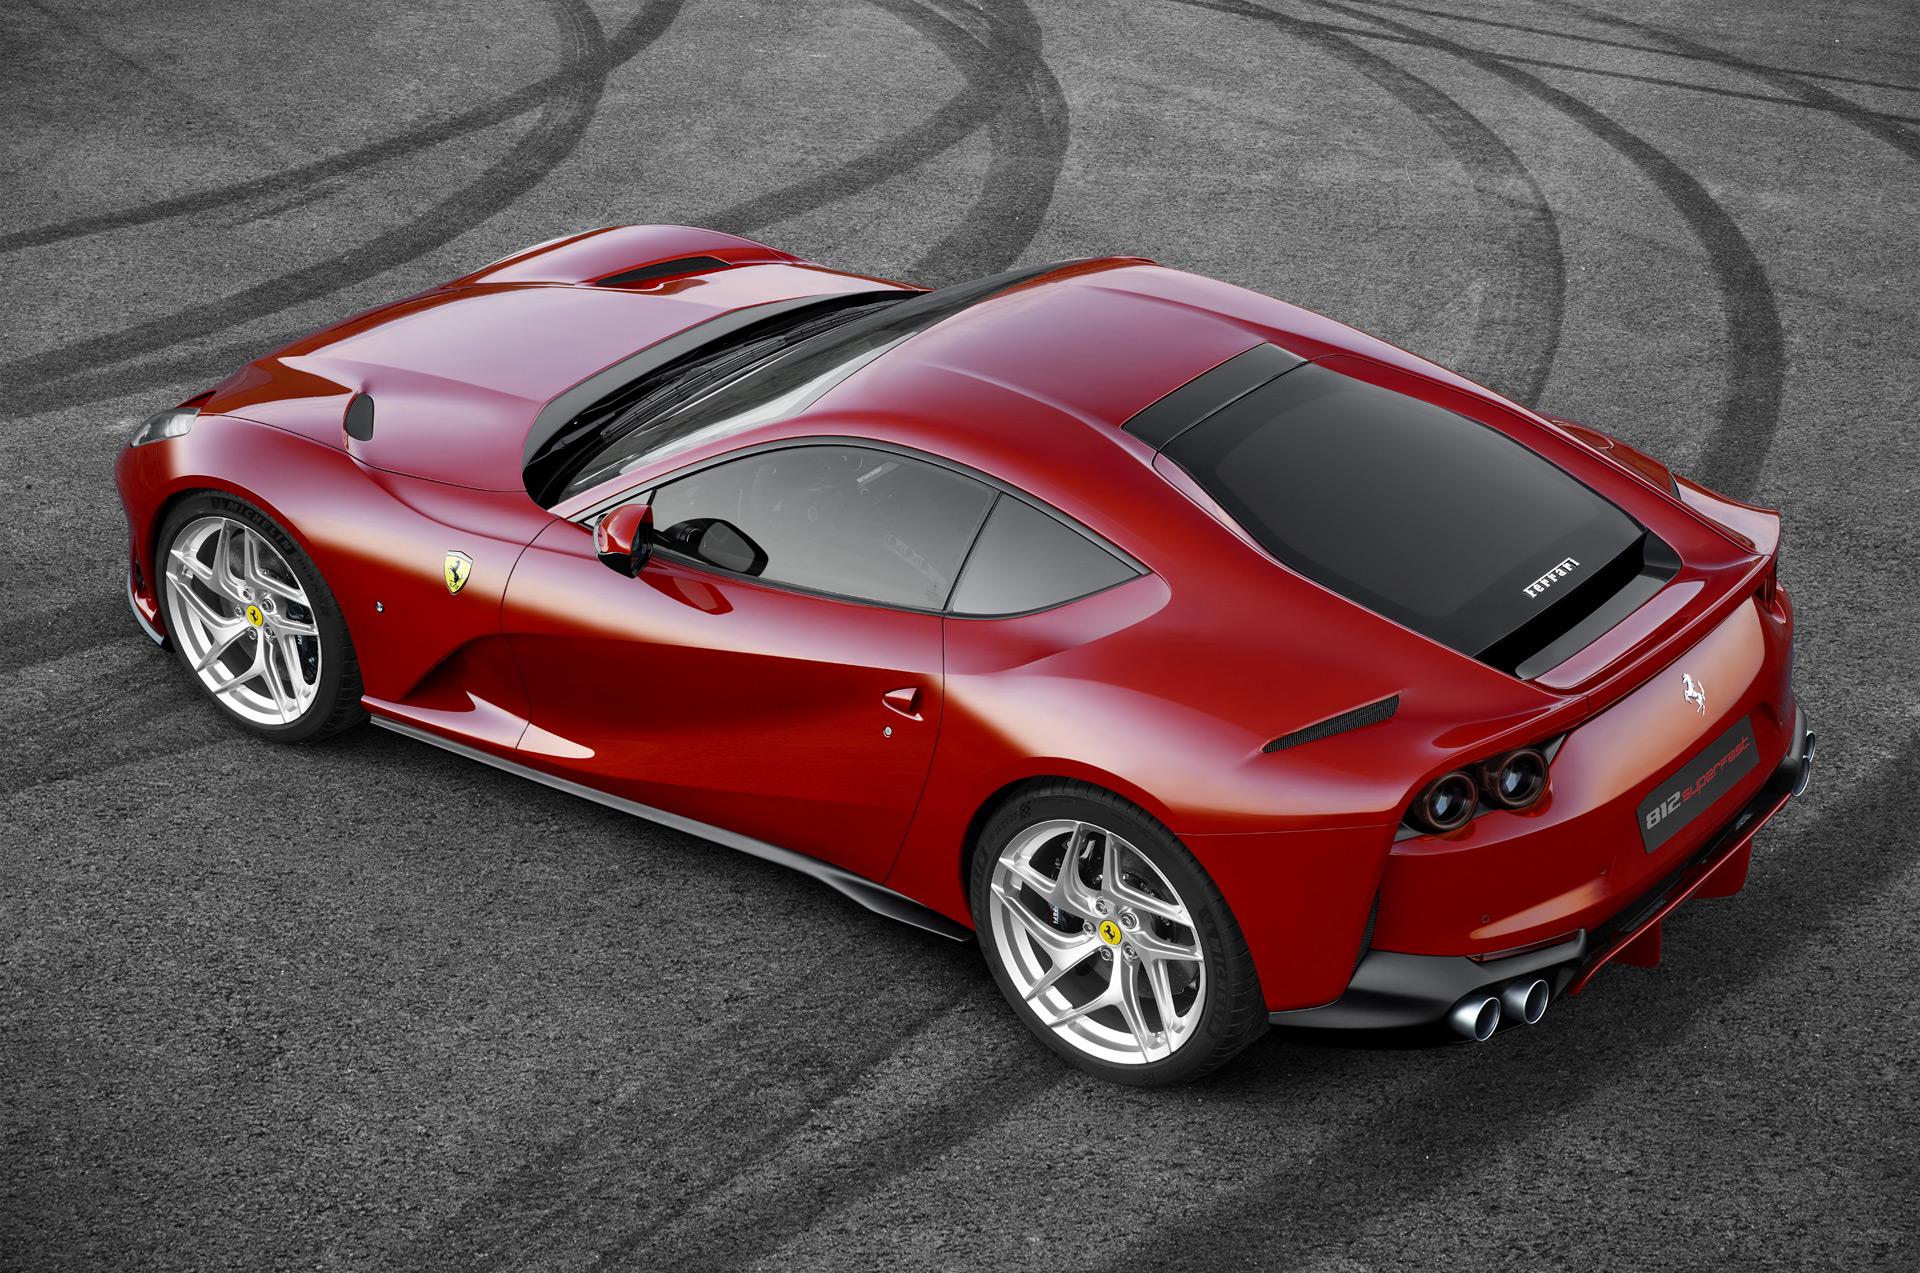 Ferrari Ev Plans Revealed In Patent Documents